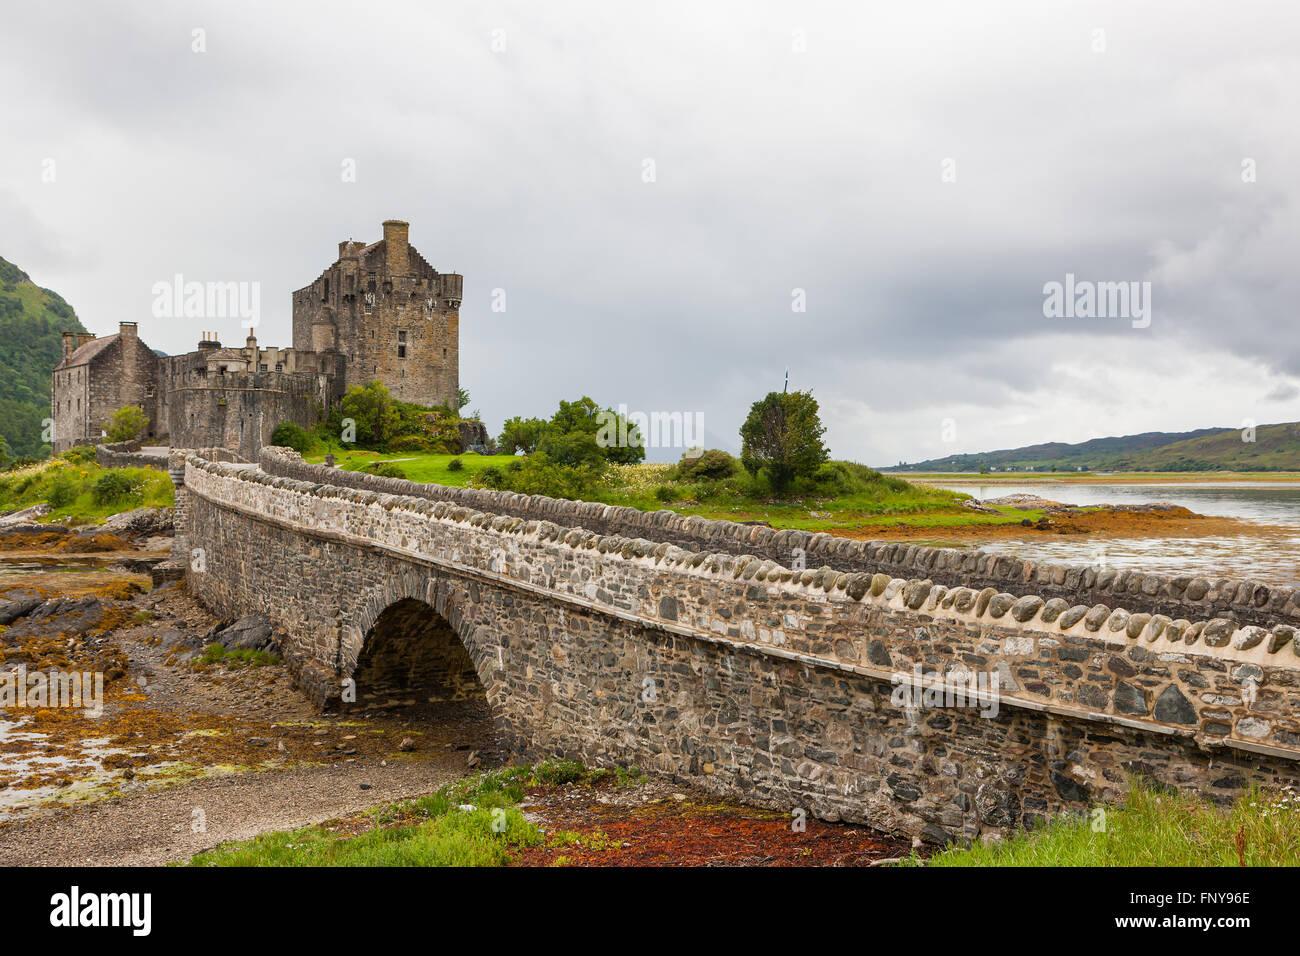 Famous Eilean Donan Castle on the Scottish highlands. - Stock Image